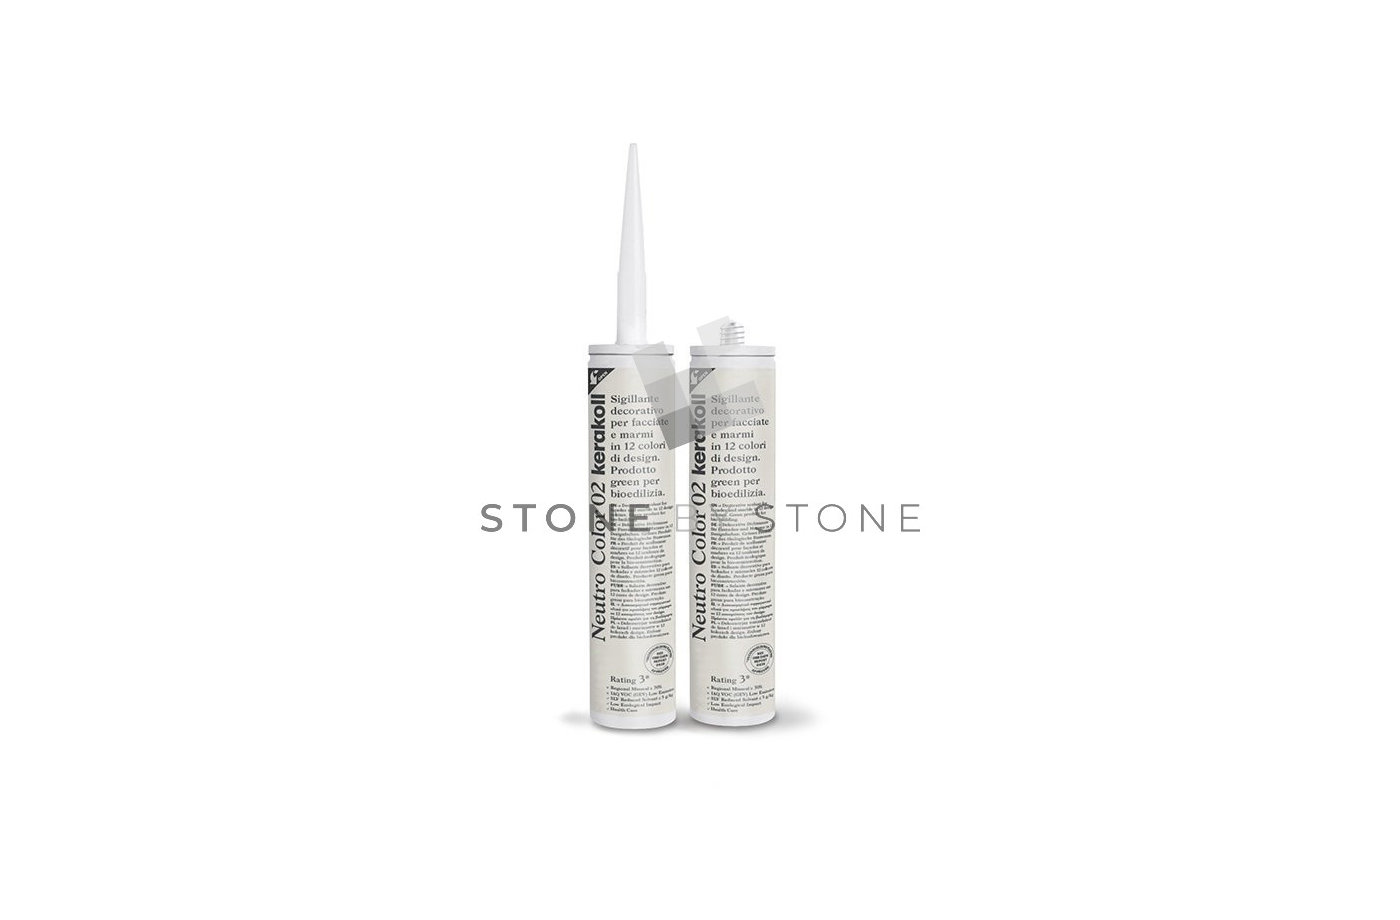 Silicone spécial pierre - KERAKOLL - Neutro Color Crème (20) - 310 ml